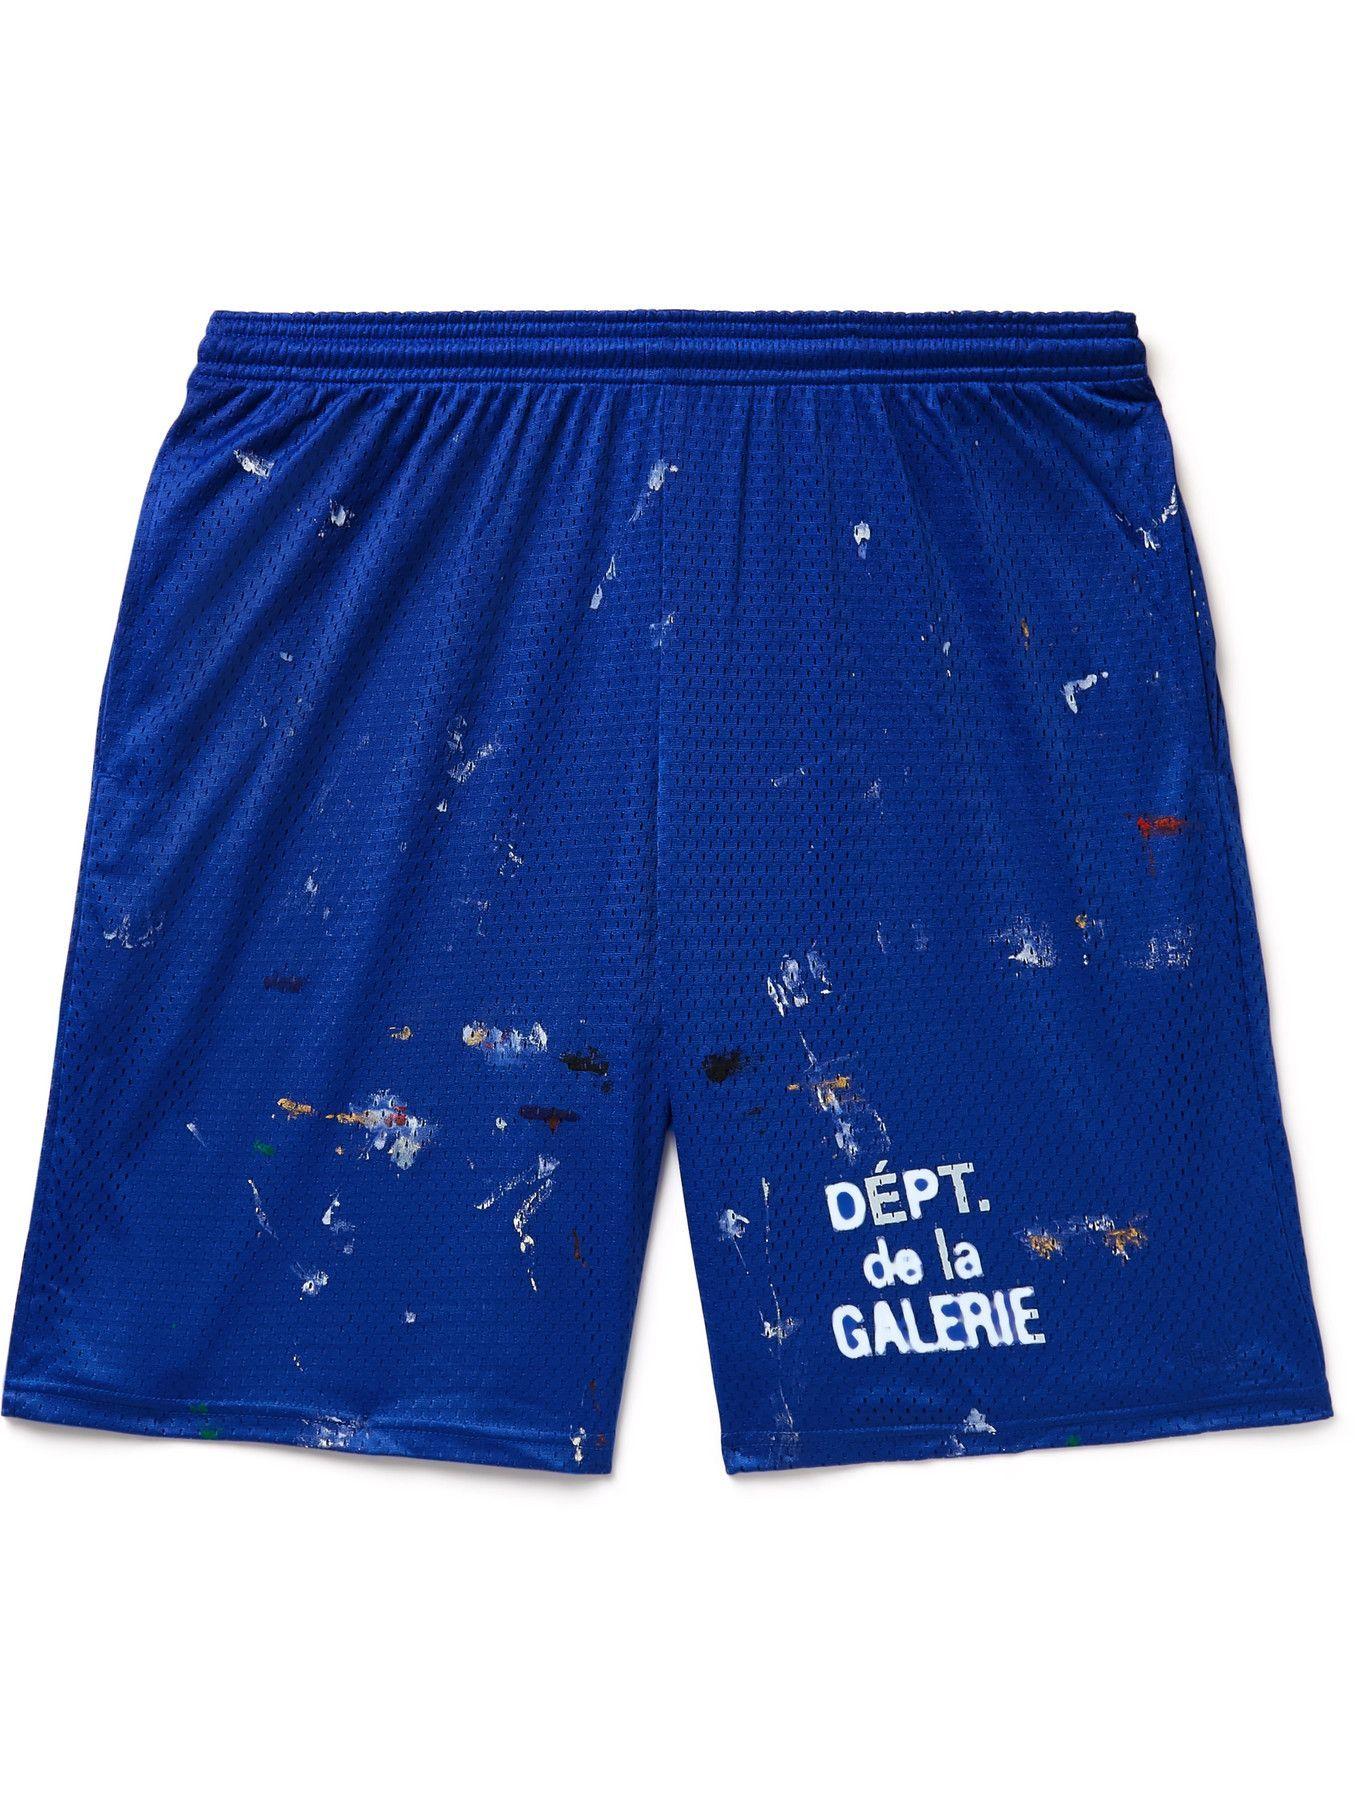 Photo: Gallery Dept. - Studio Gym Logo-Print Paint-Splattered Mesh Shorts - Blue